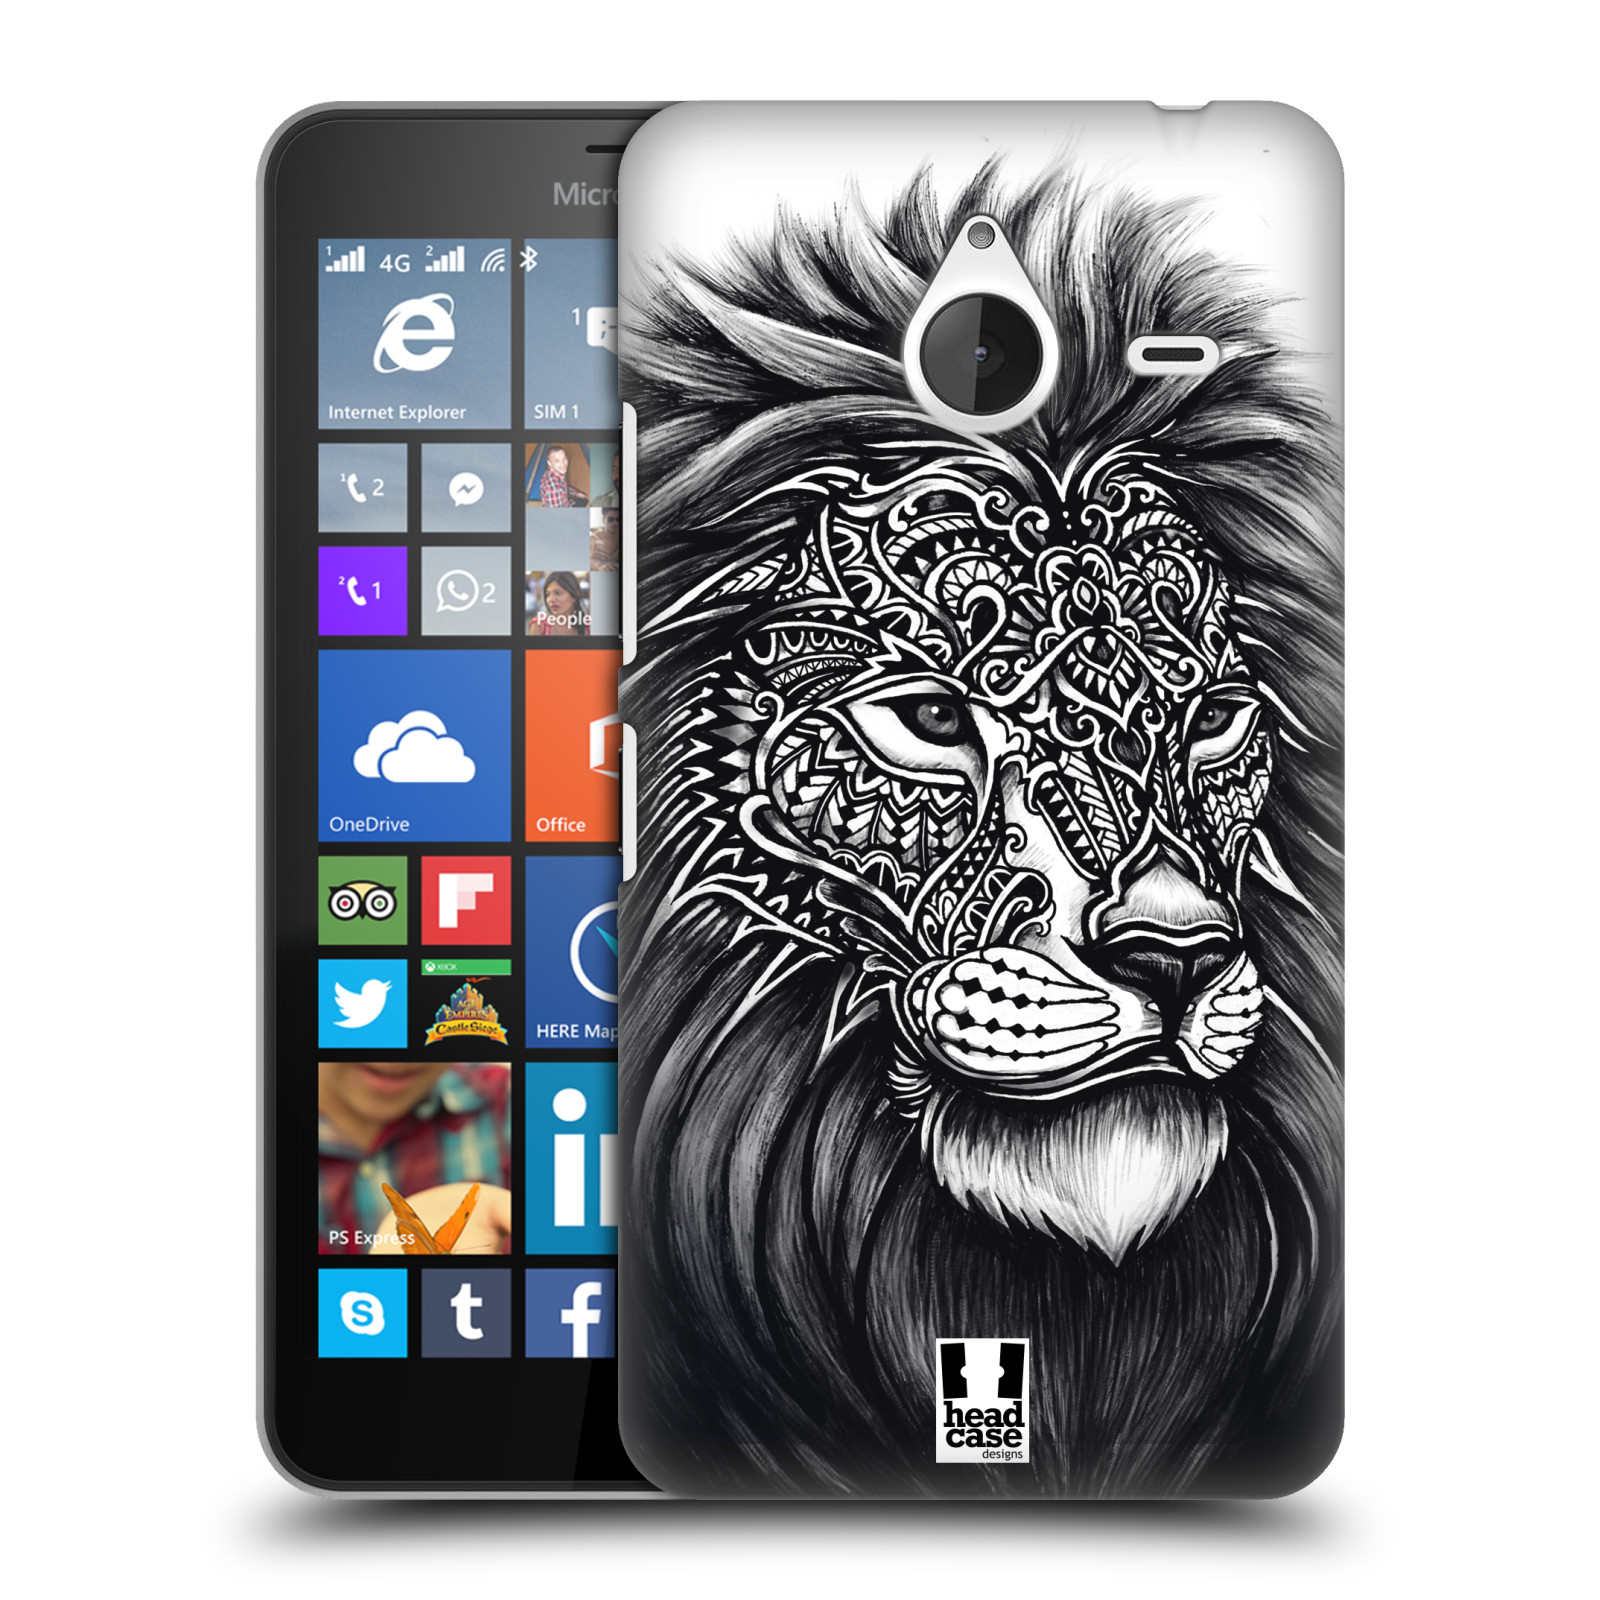 Plastové pouzdro na mobil Microsoft Lumia 640 XL HEAD CASE Zdobený Lev (Plastový kryt či obal na mobilní telefon Microsoft Lumia 640 XL)